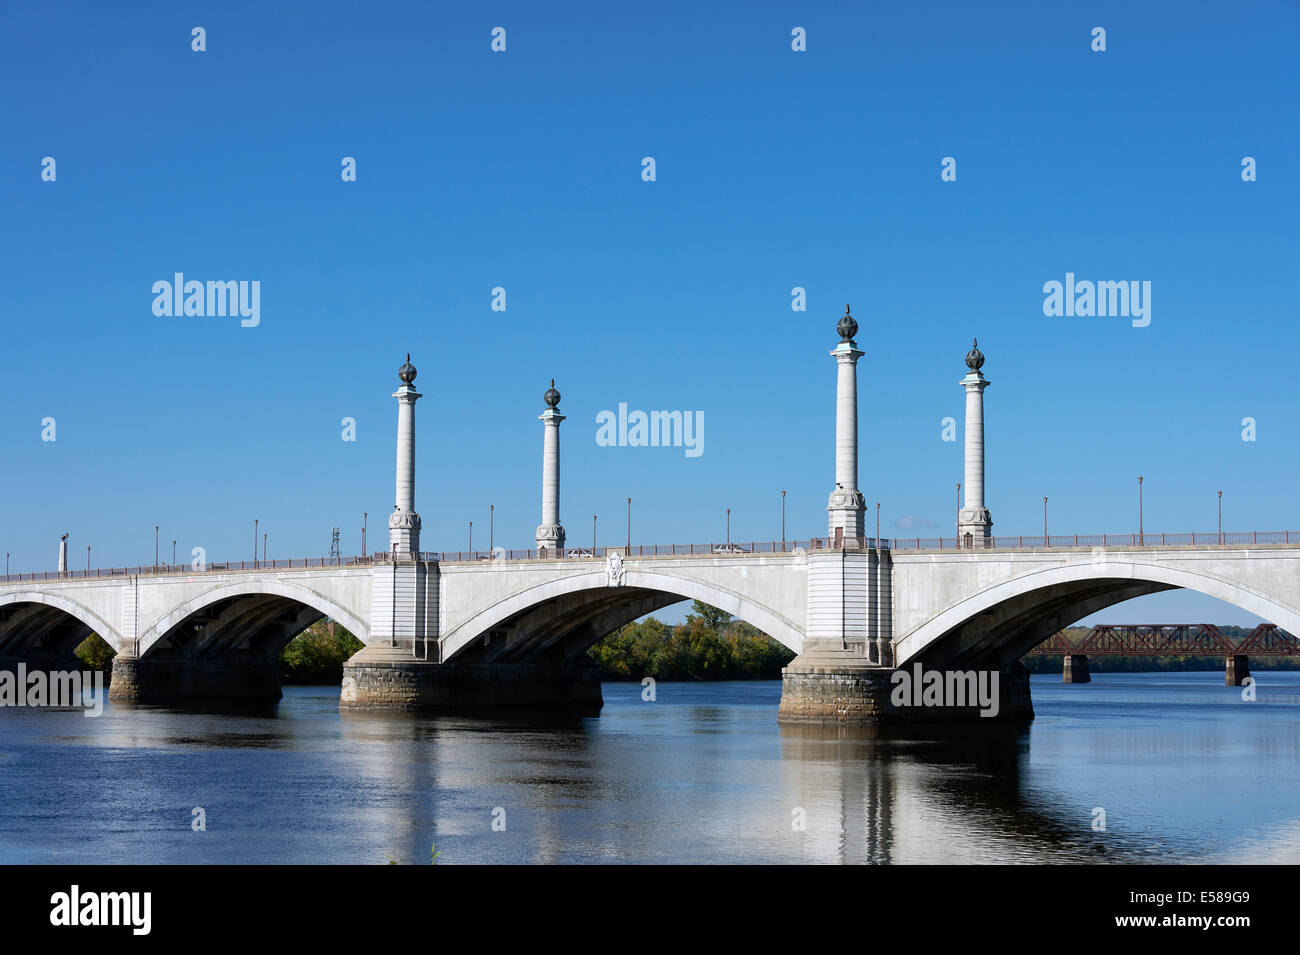 Memorial Bridge over the Connecticut River, Springfield, Massachusetts, USA - Stock Image